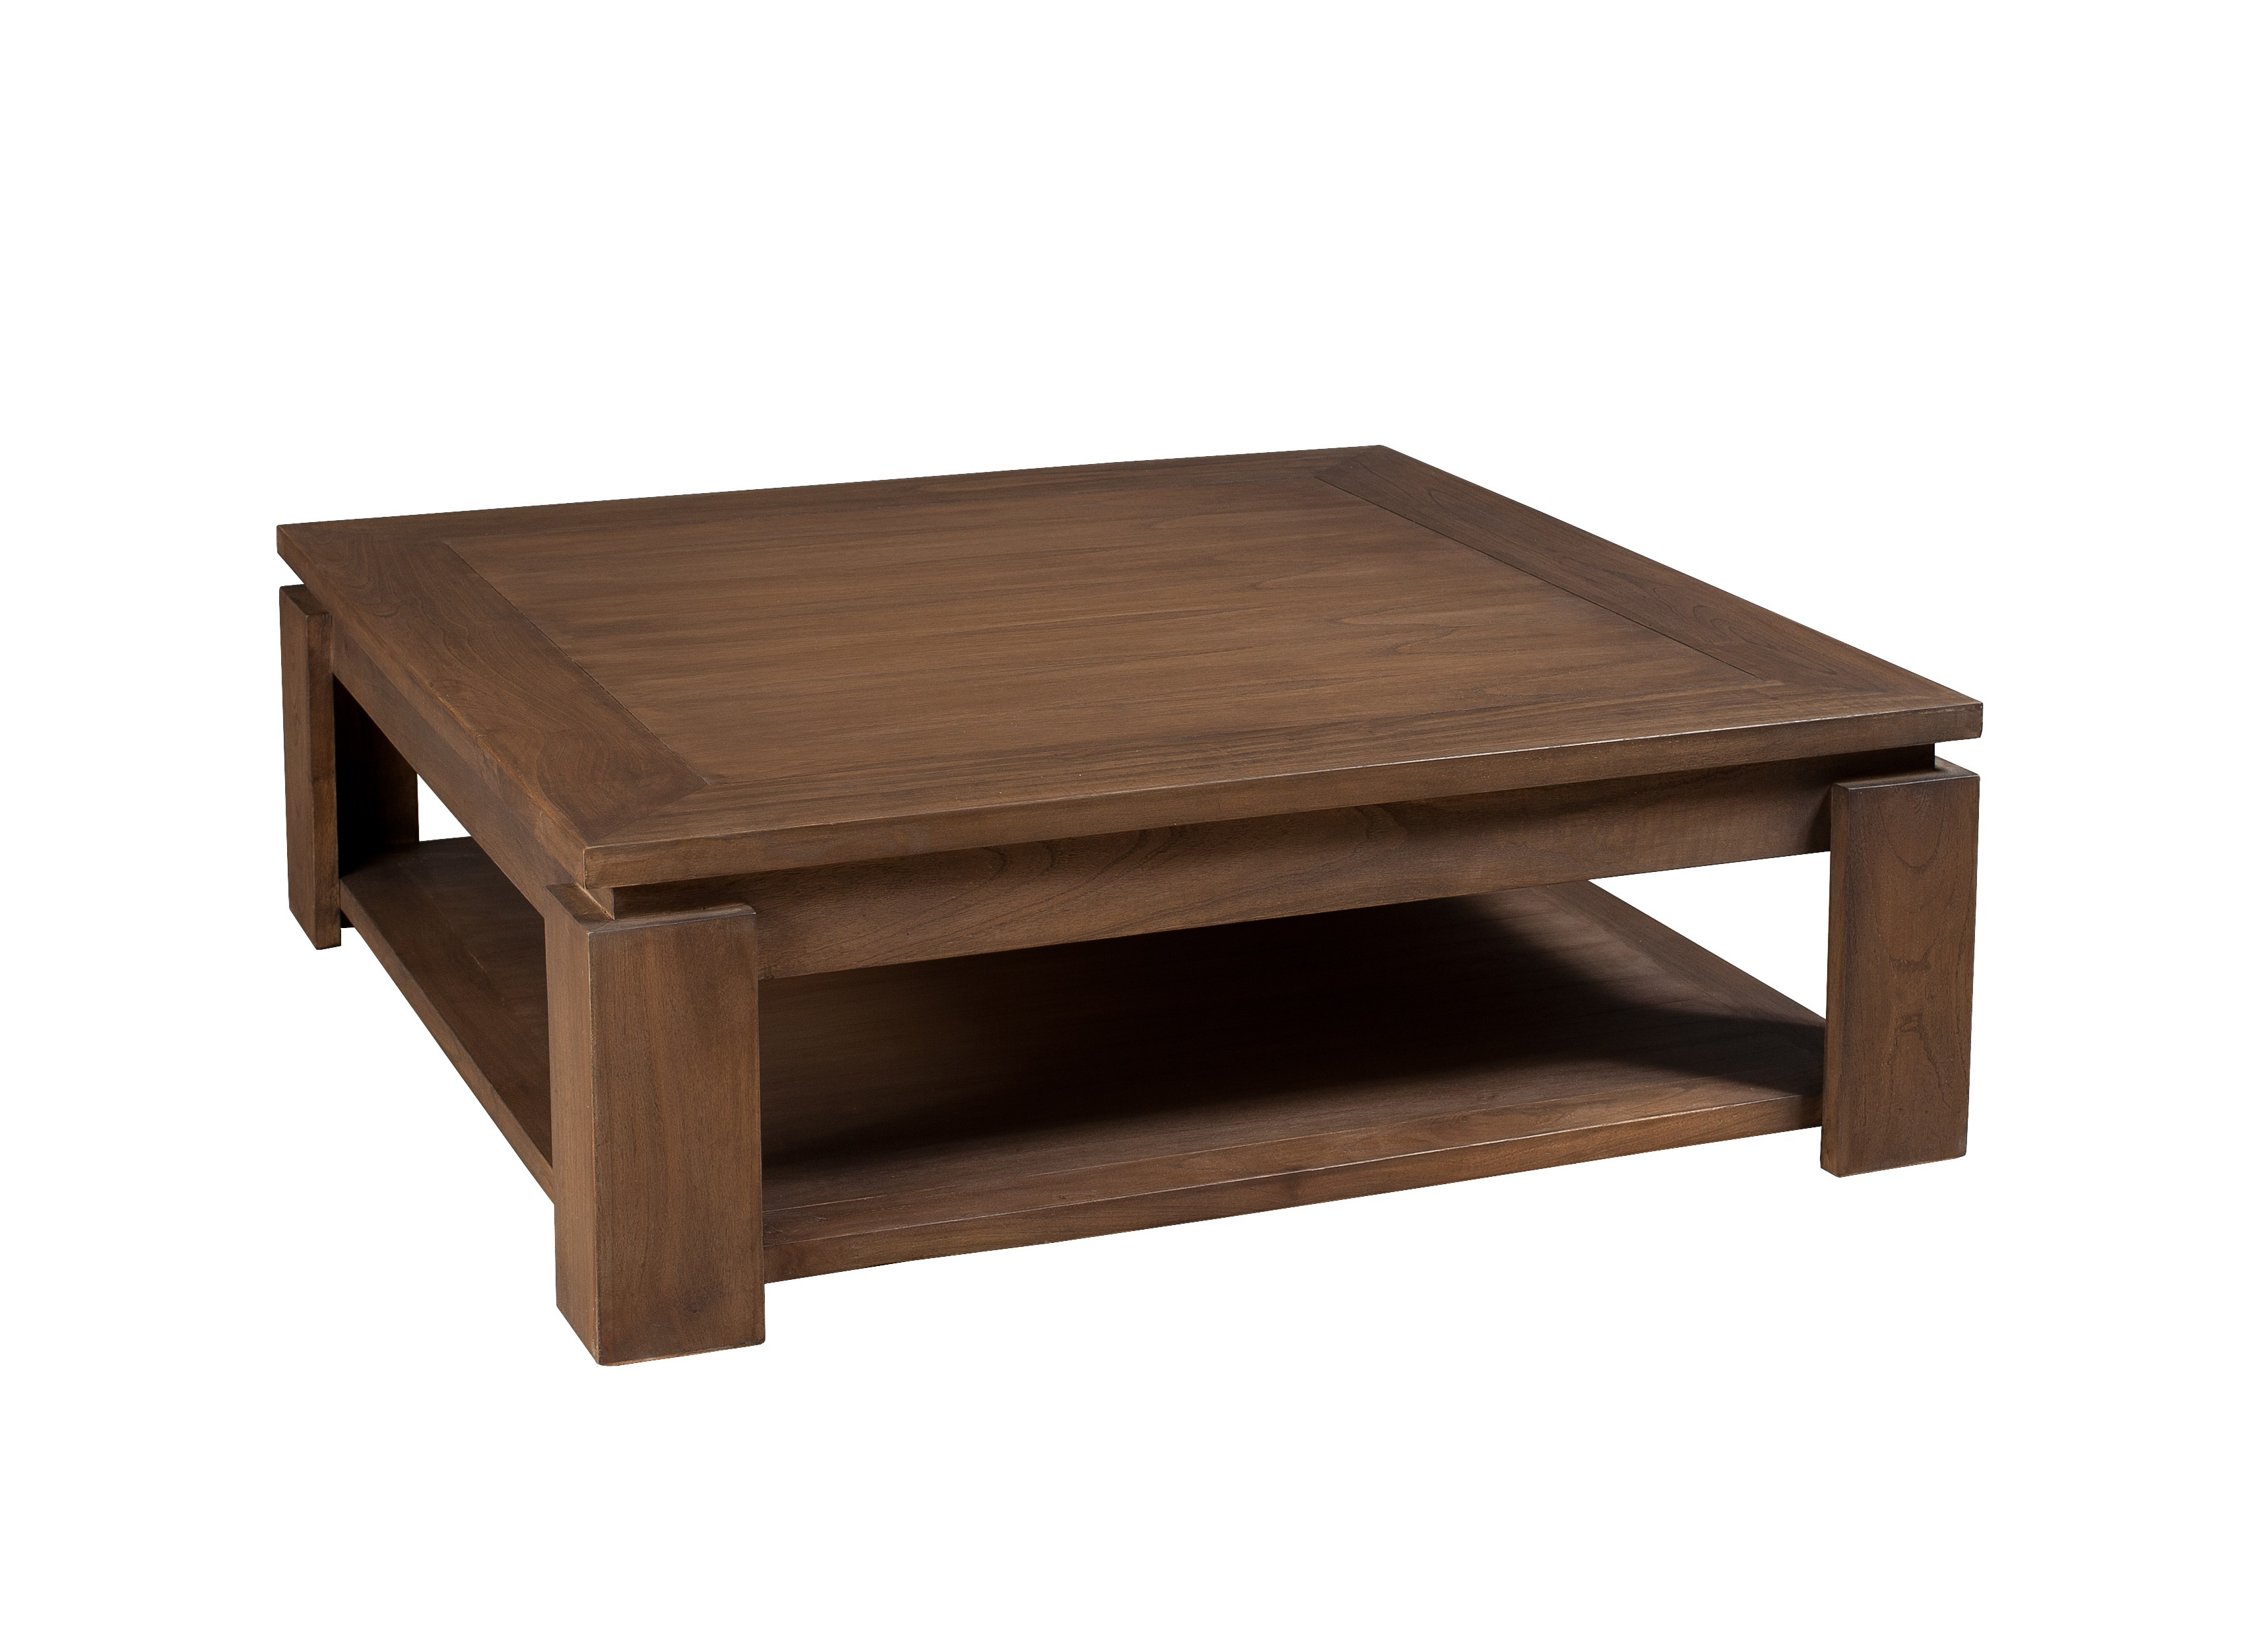 Grande table basse carree bois